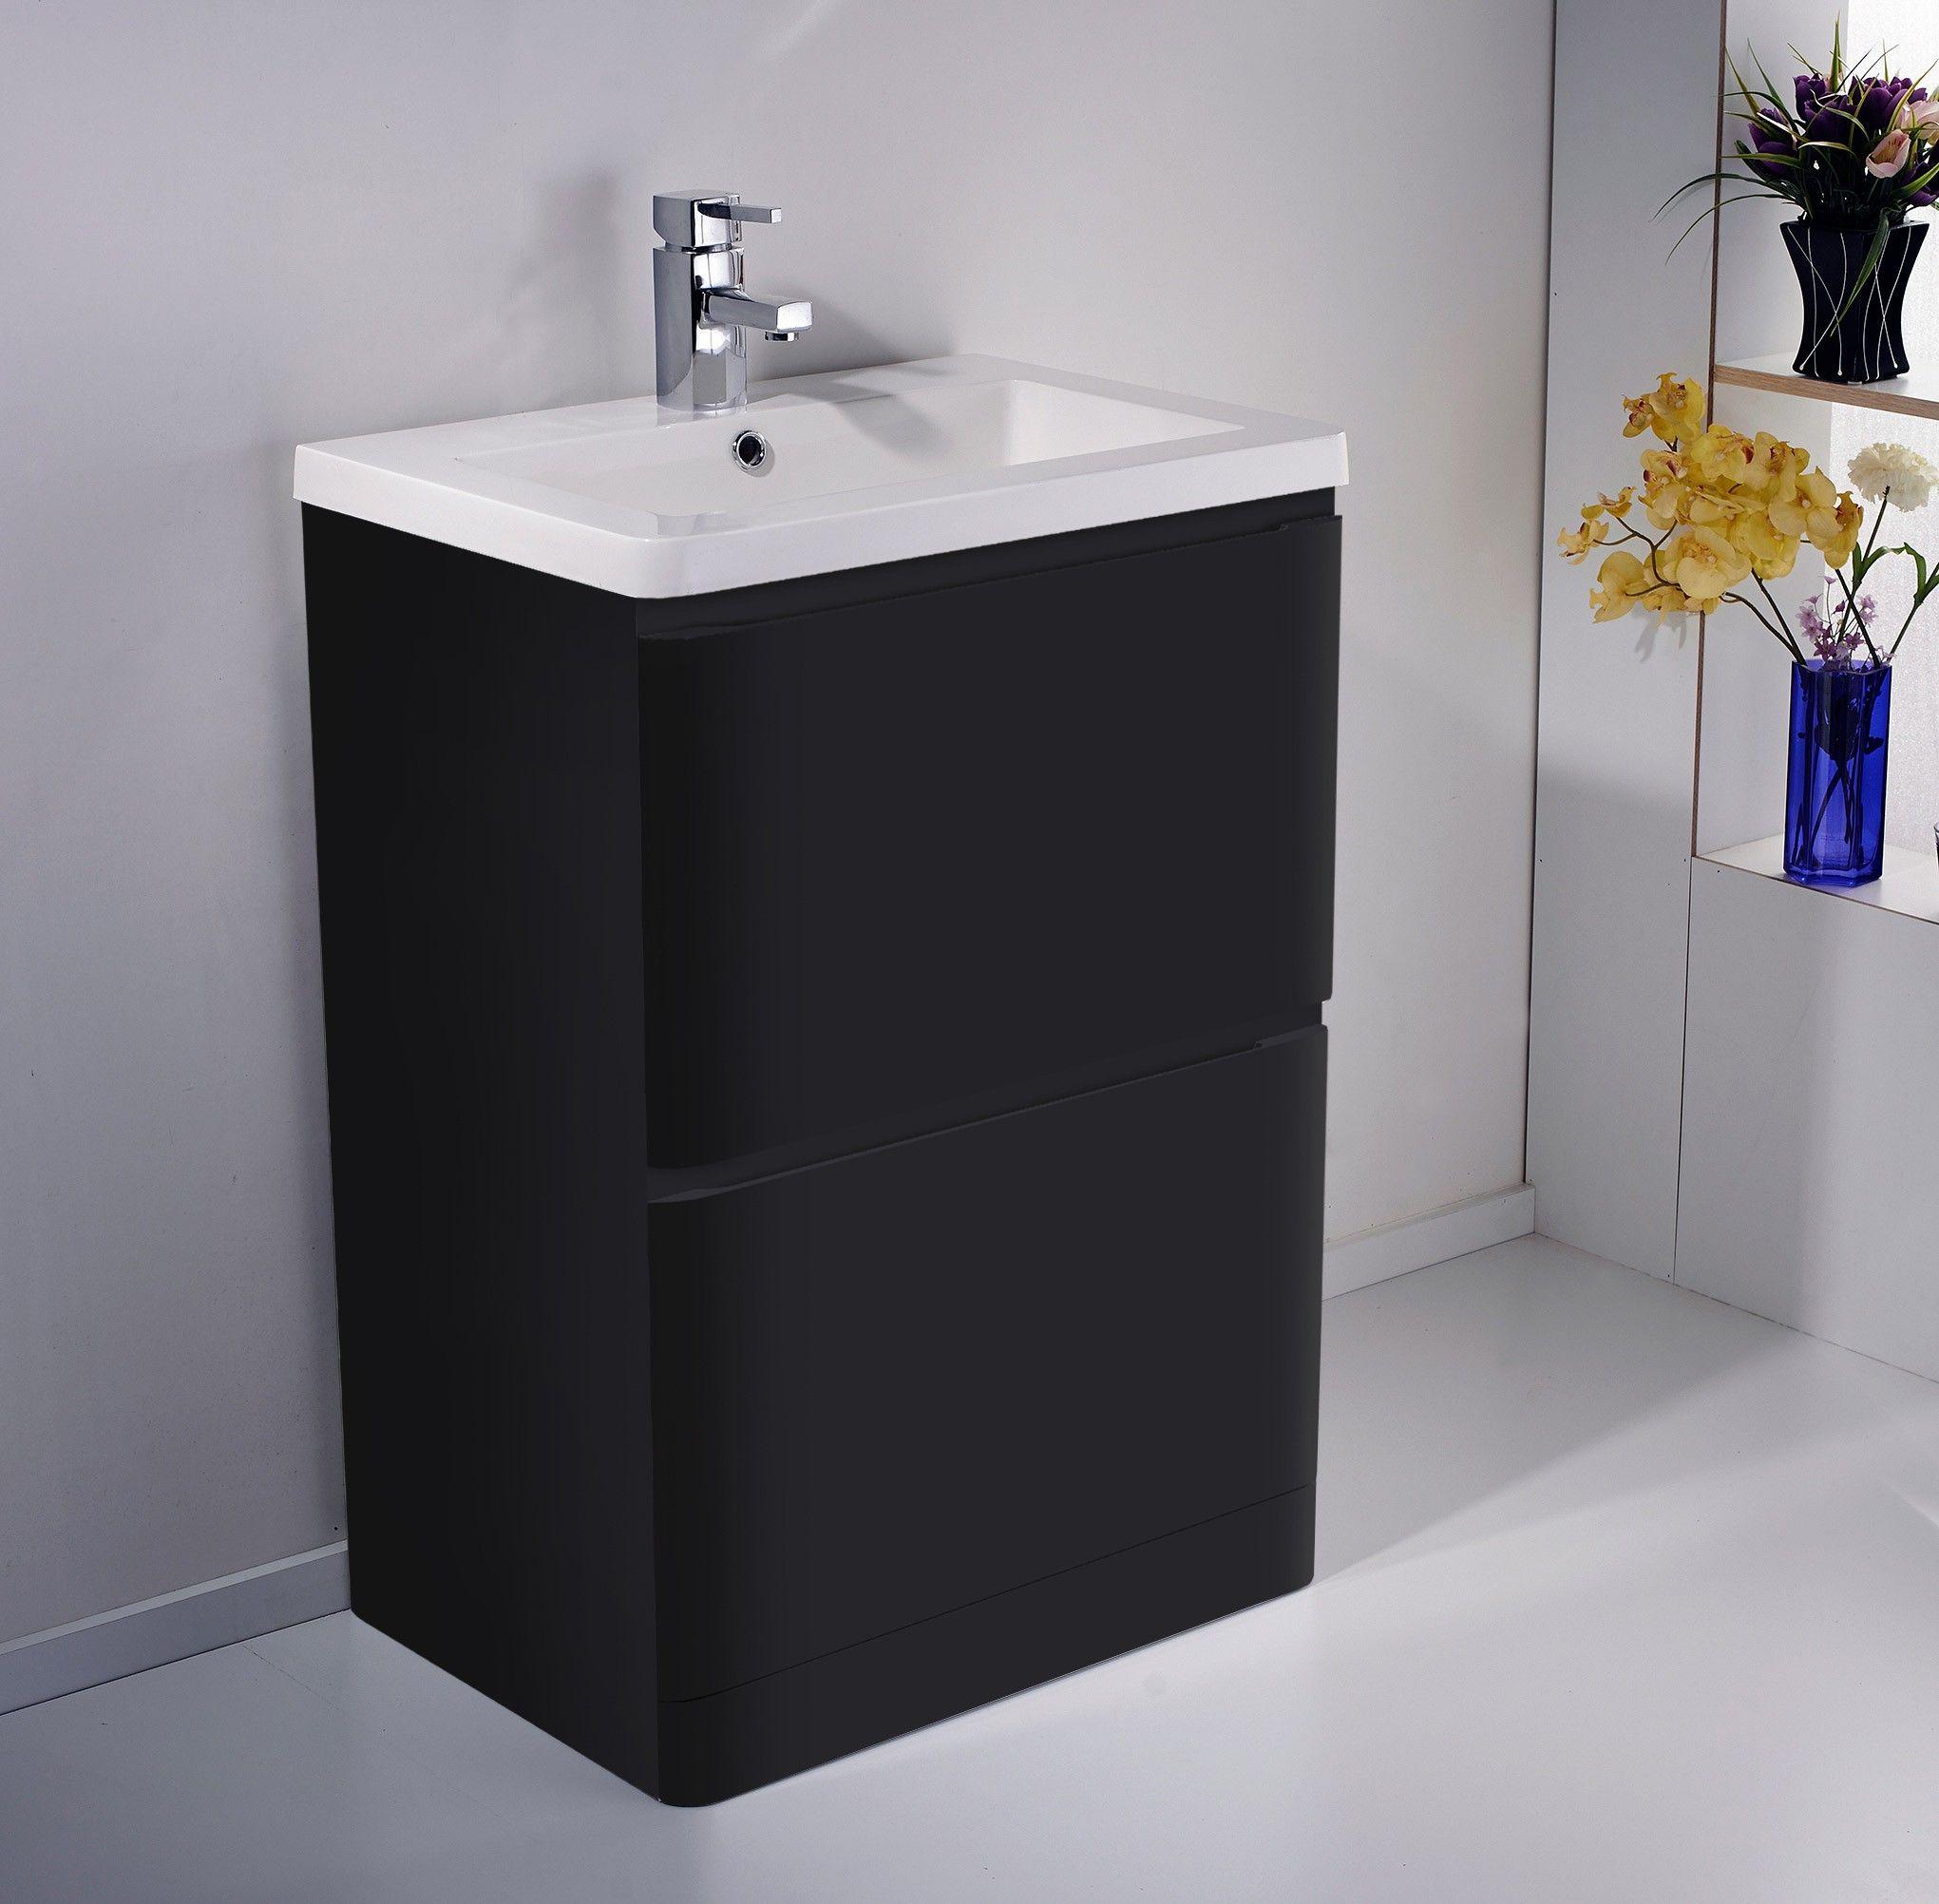 42+ Freestanding bathroom basin cabinets custom